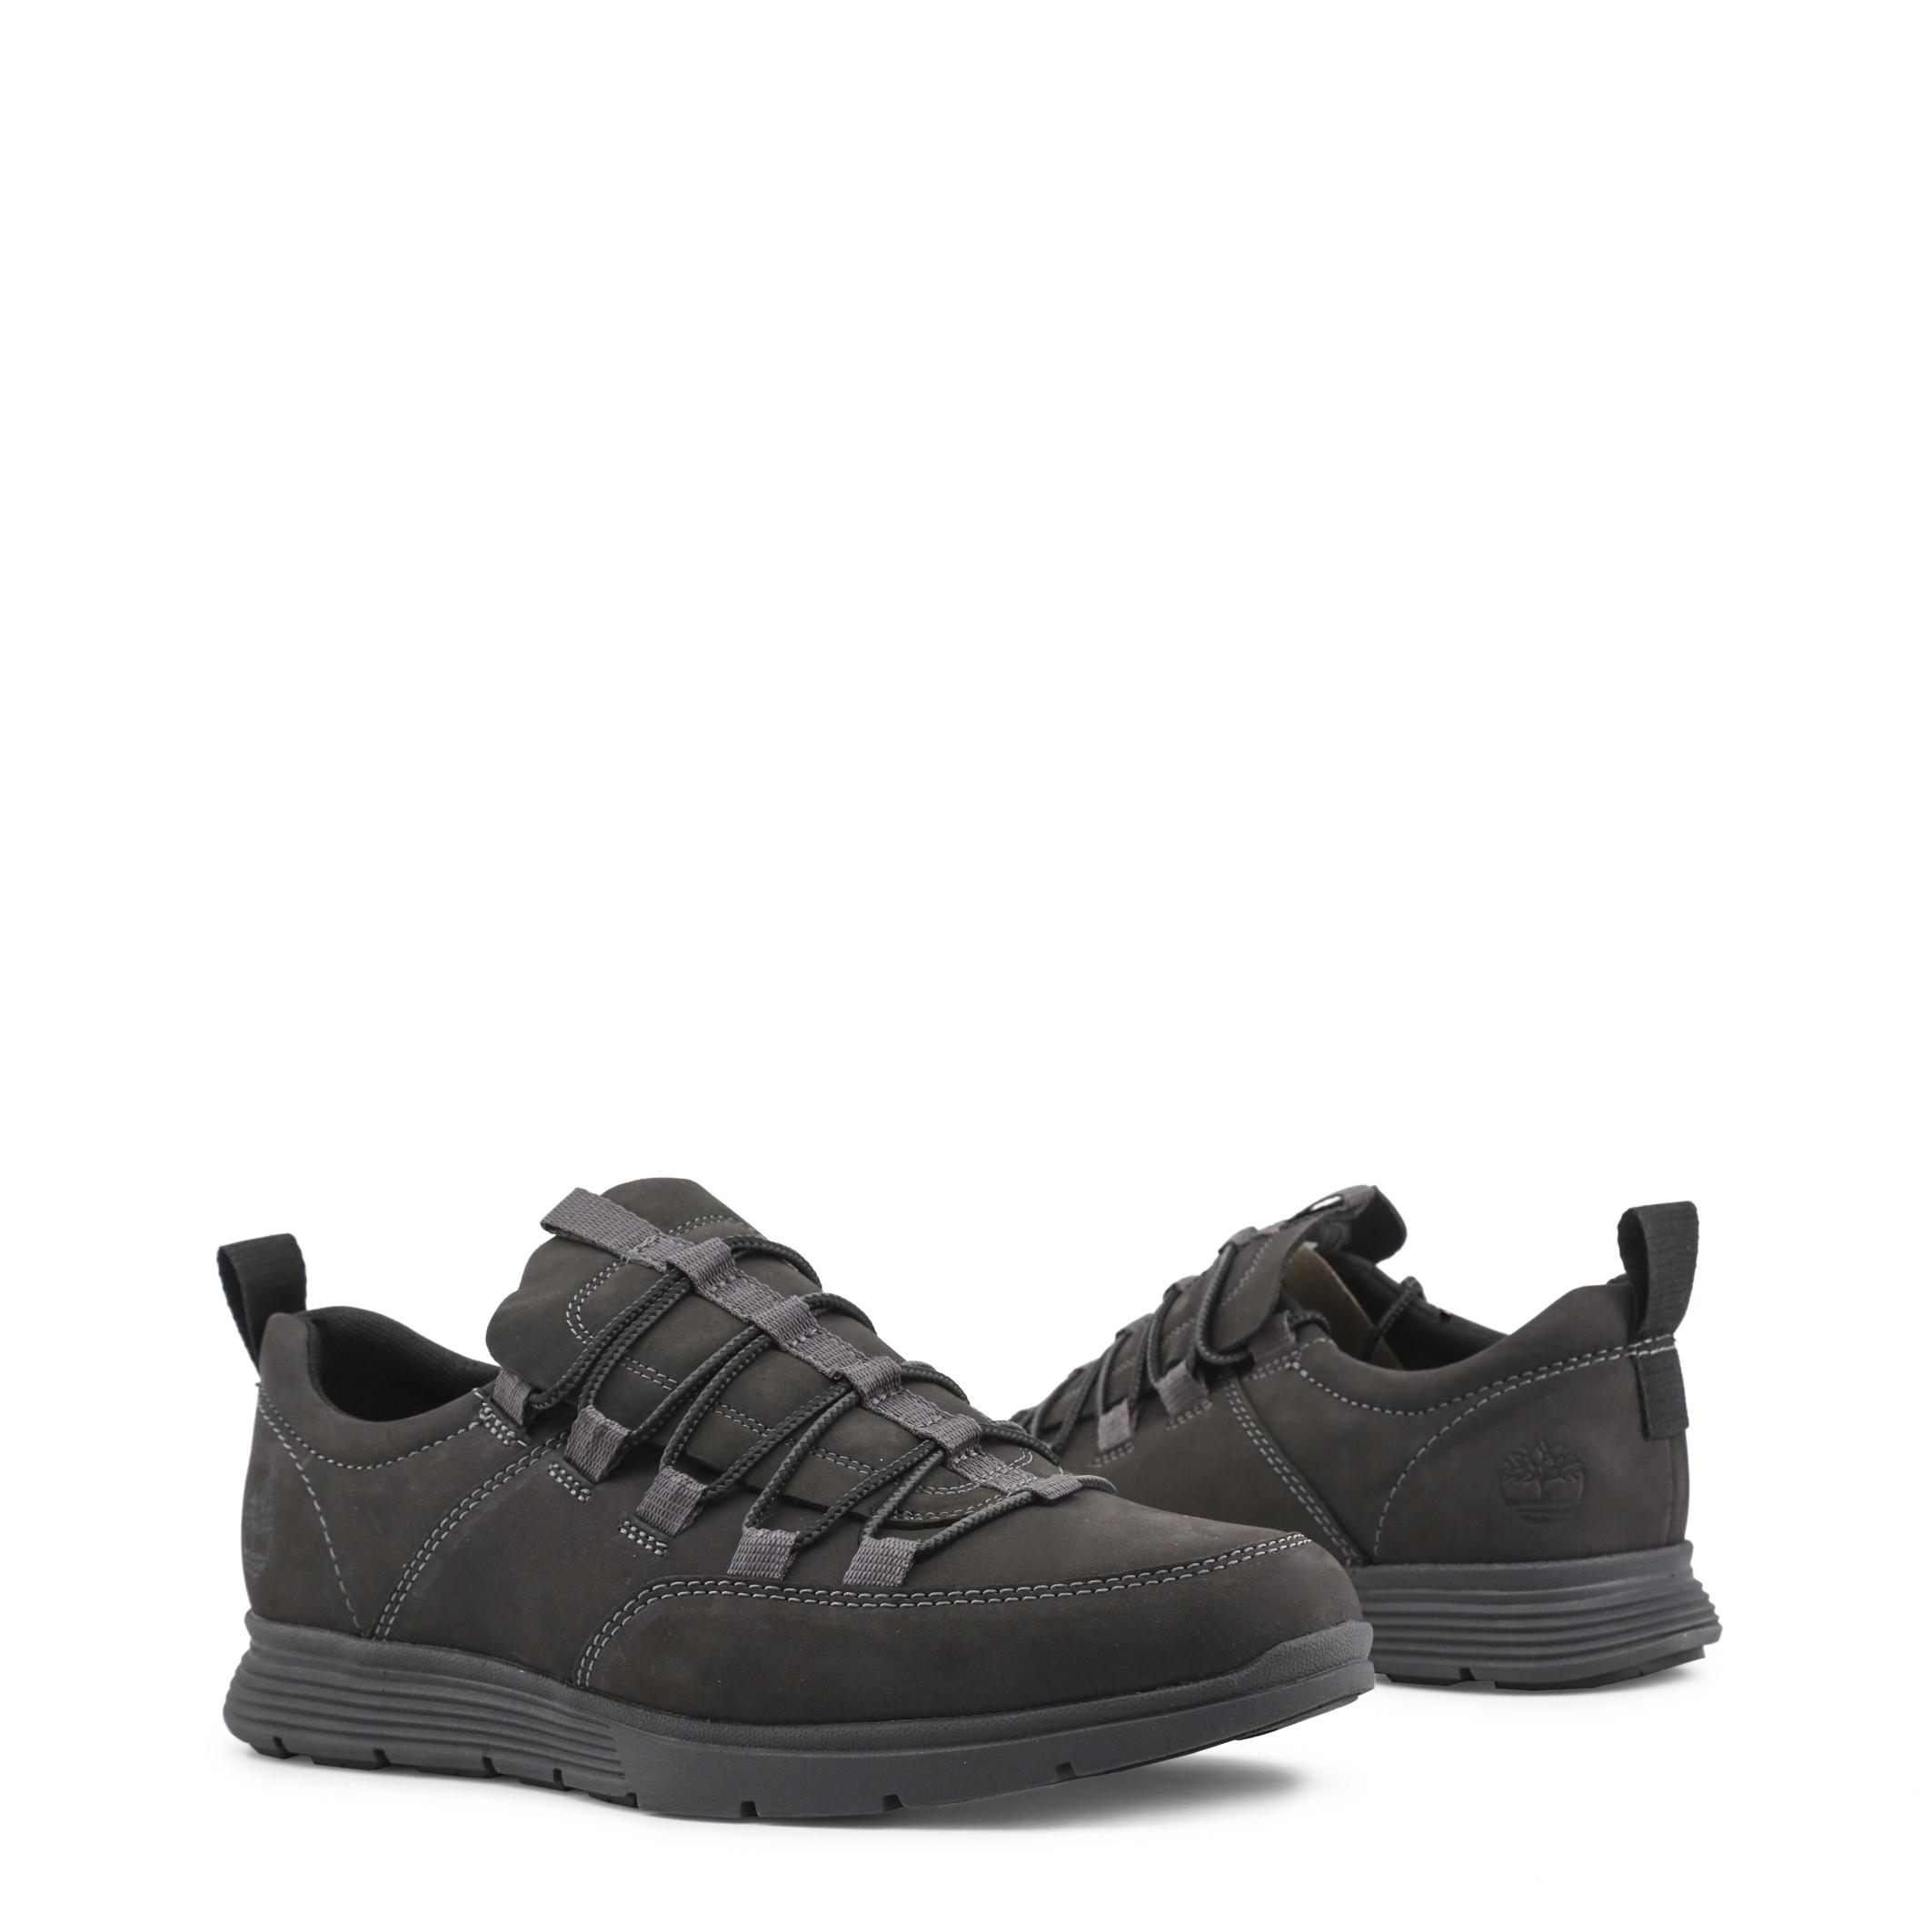 Sneakers-Timberland-KILLINGTON-TB0A1O-Uomo-Grigio-94751 miniatura 2